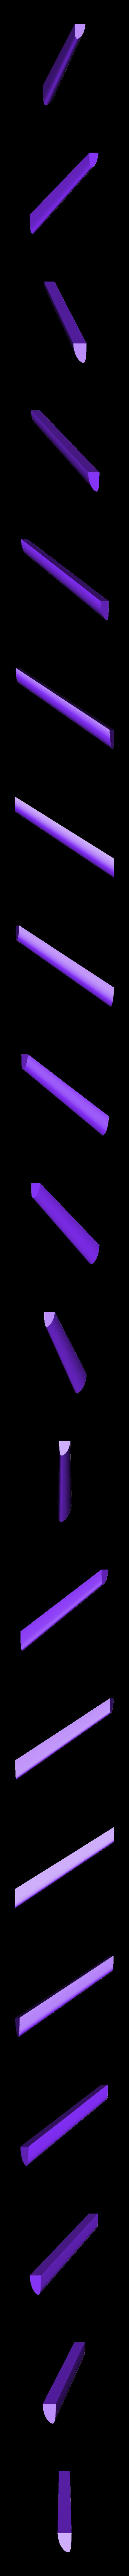 inner_wing_1.stl Download free STL file Leading-Edge Slats for Horten Wing Stiletto • 3D printer model, wersy